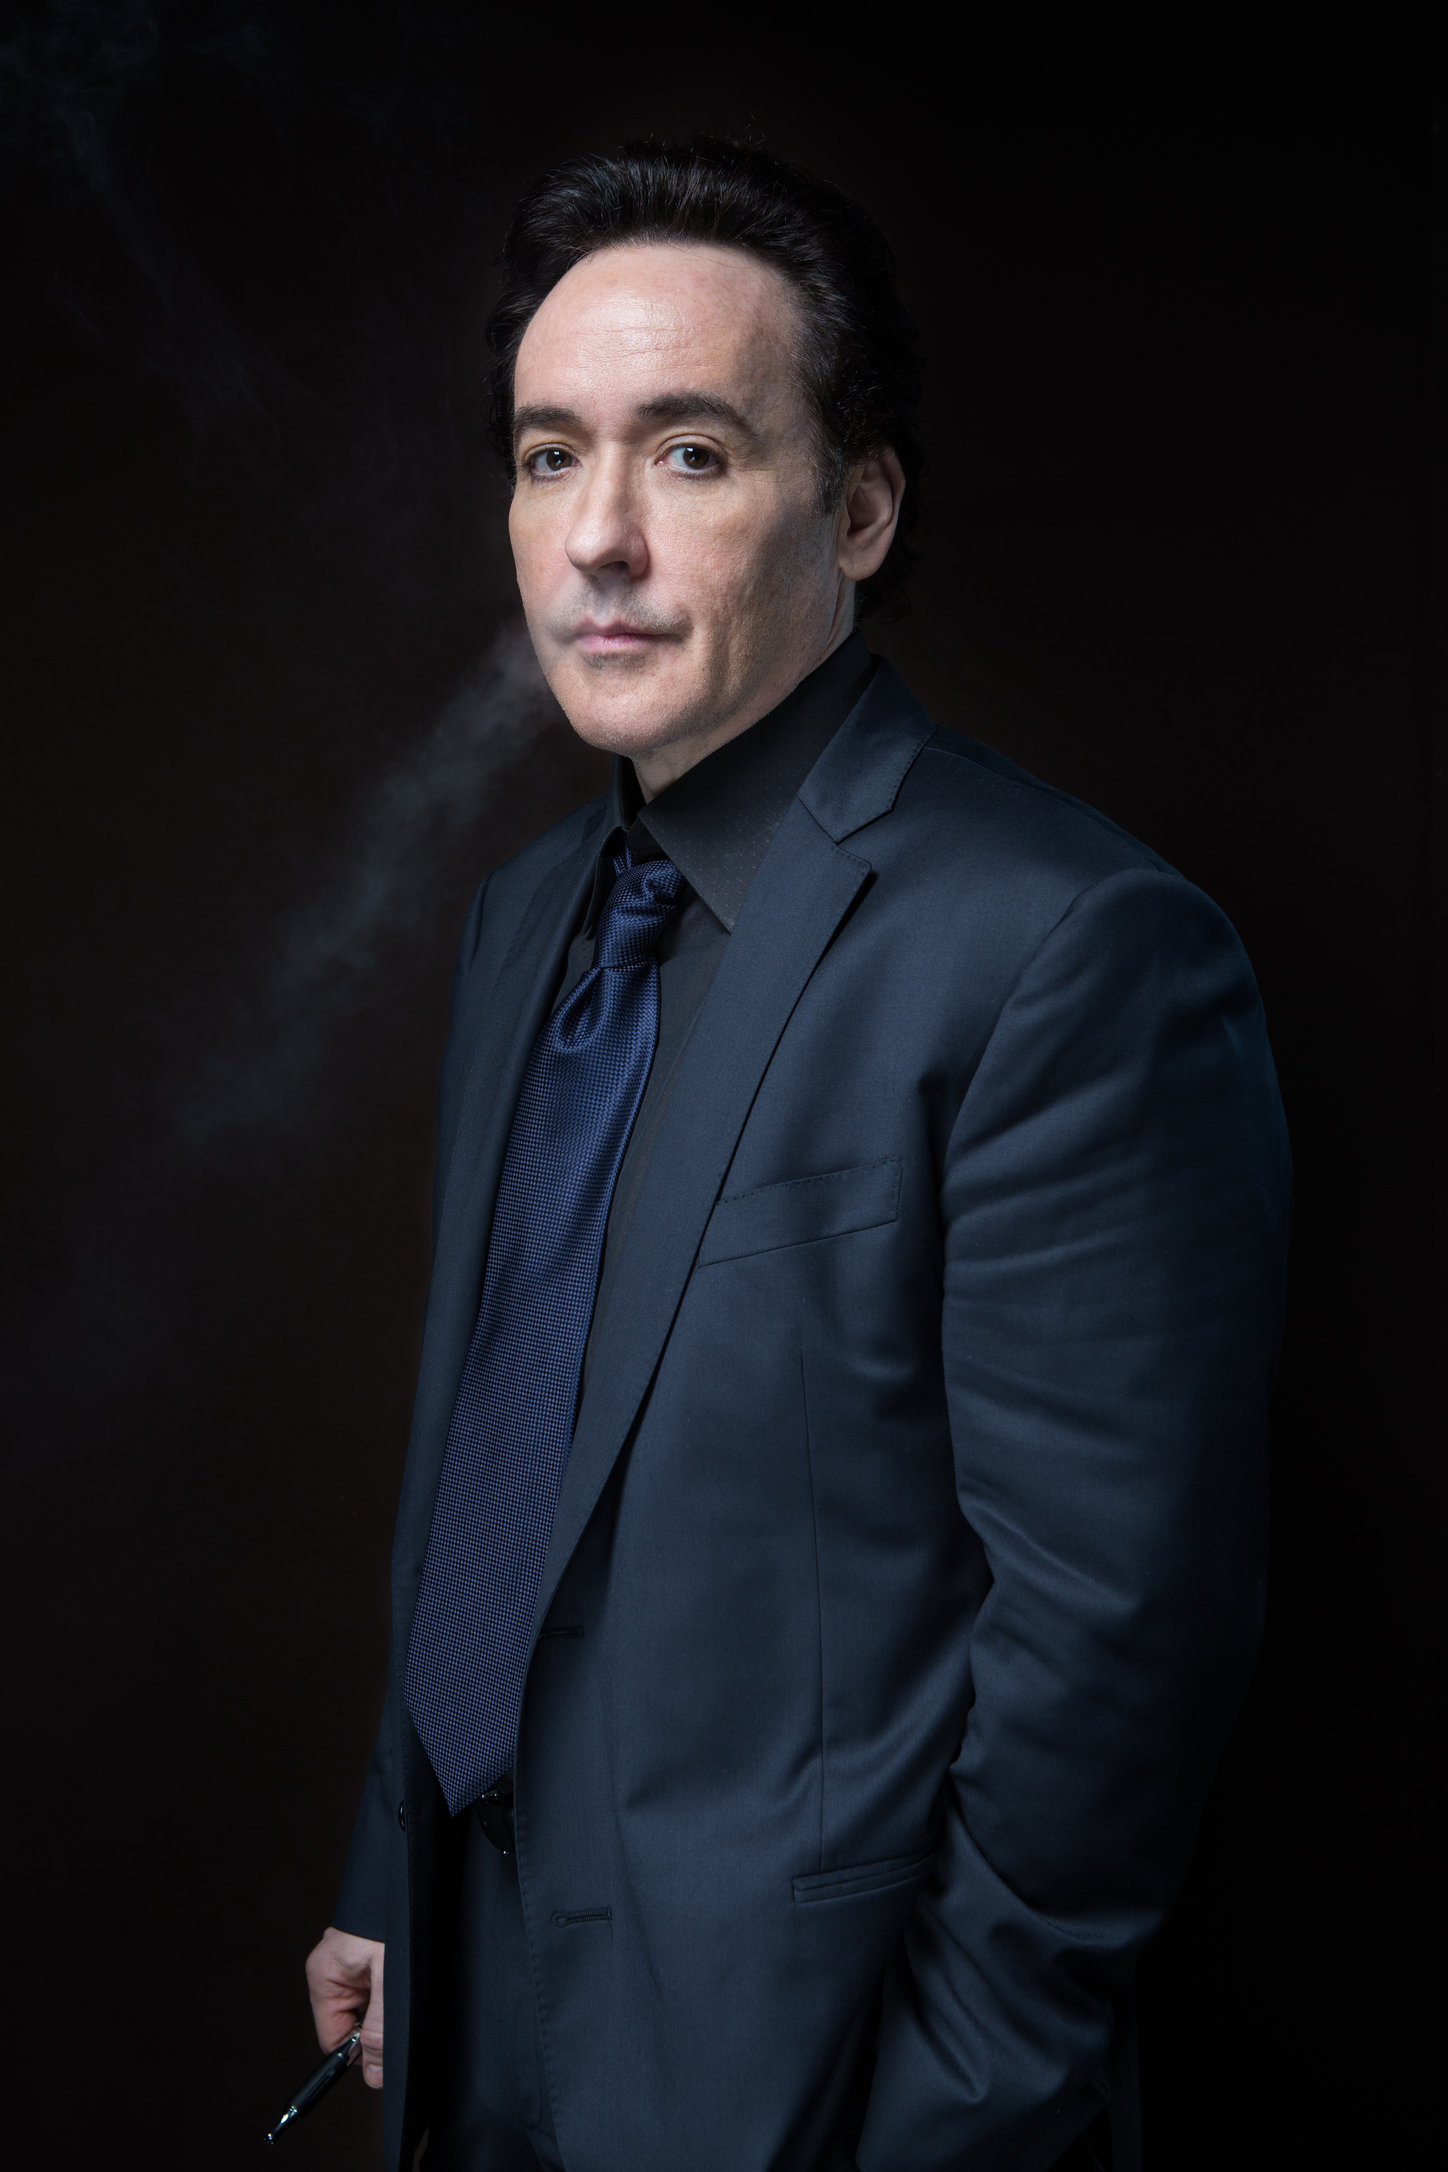 john cusack, actor